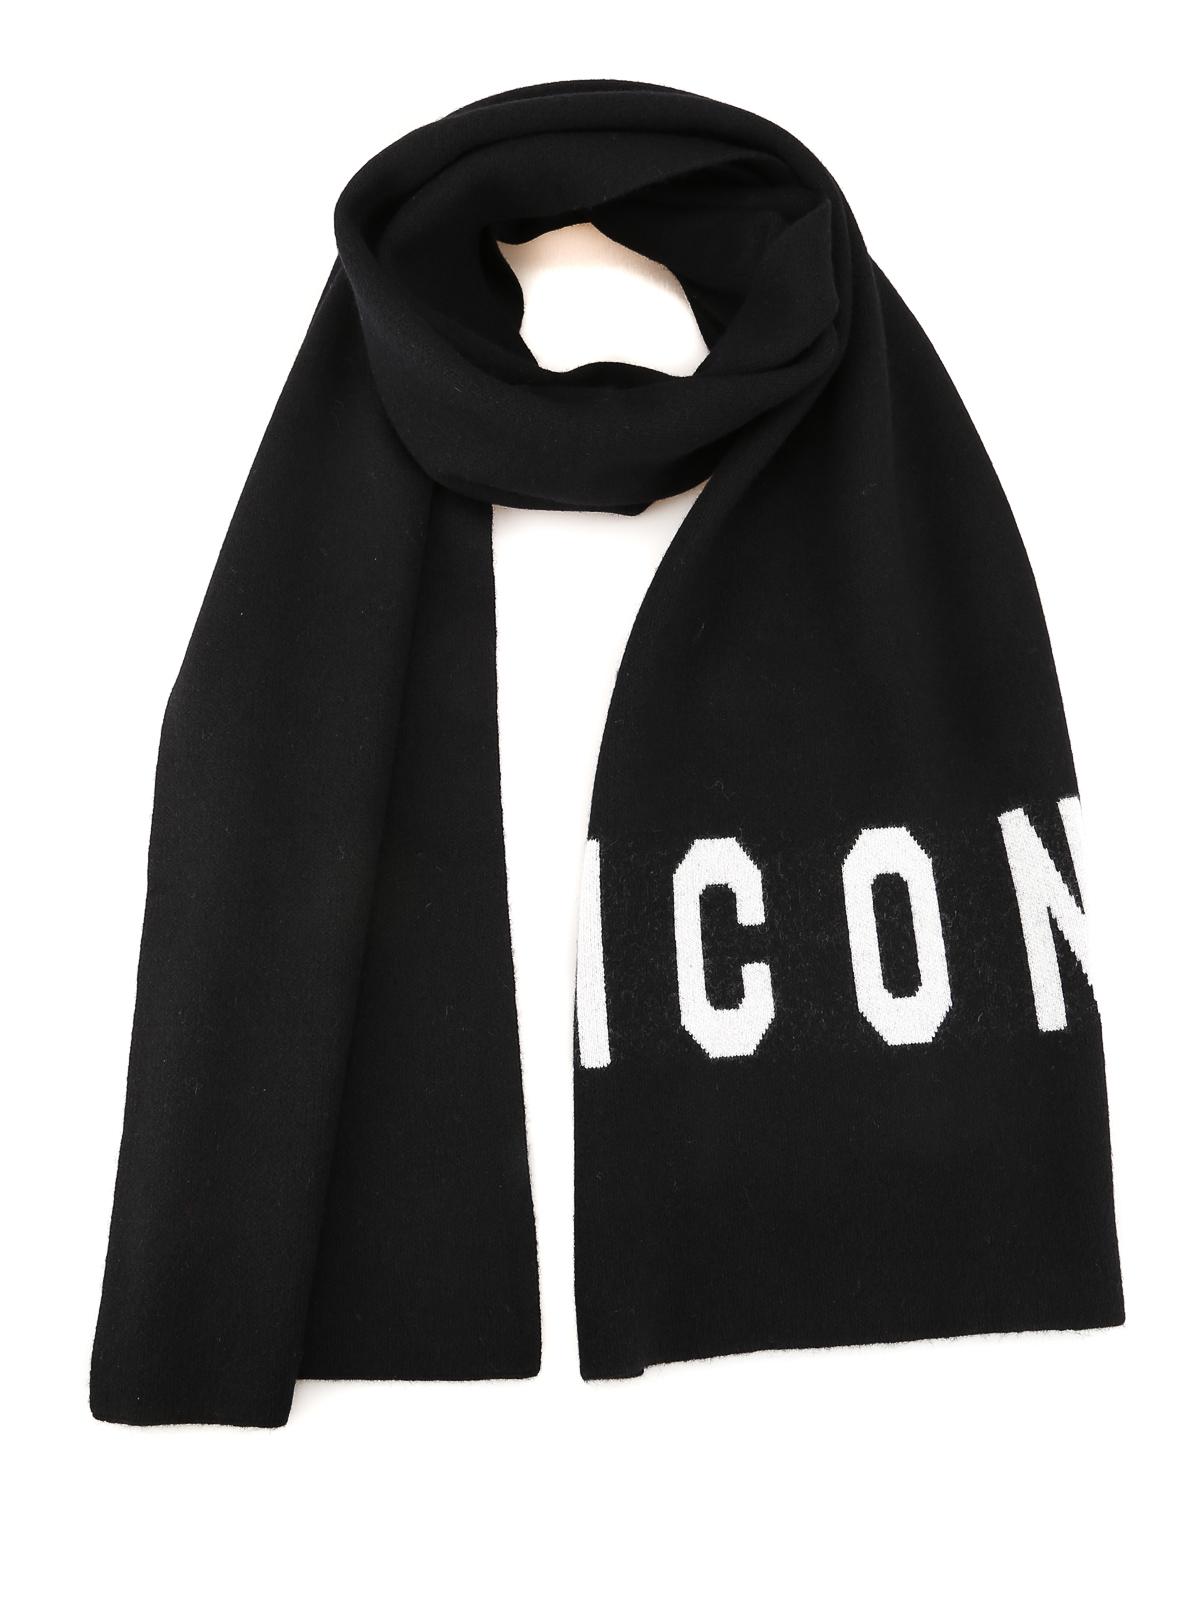 Dsquared2 Jacquard Logo Wool Blend Scarf In Black